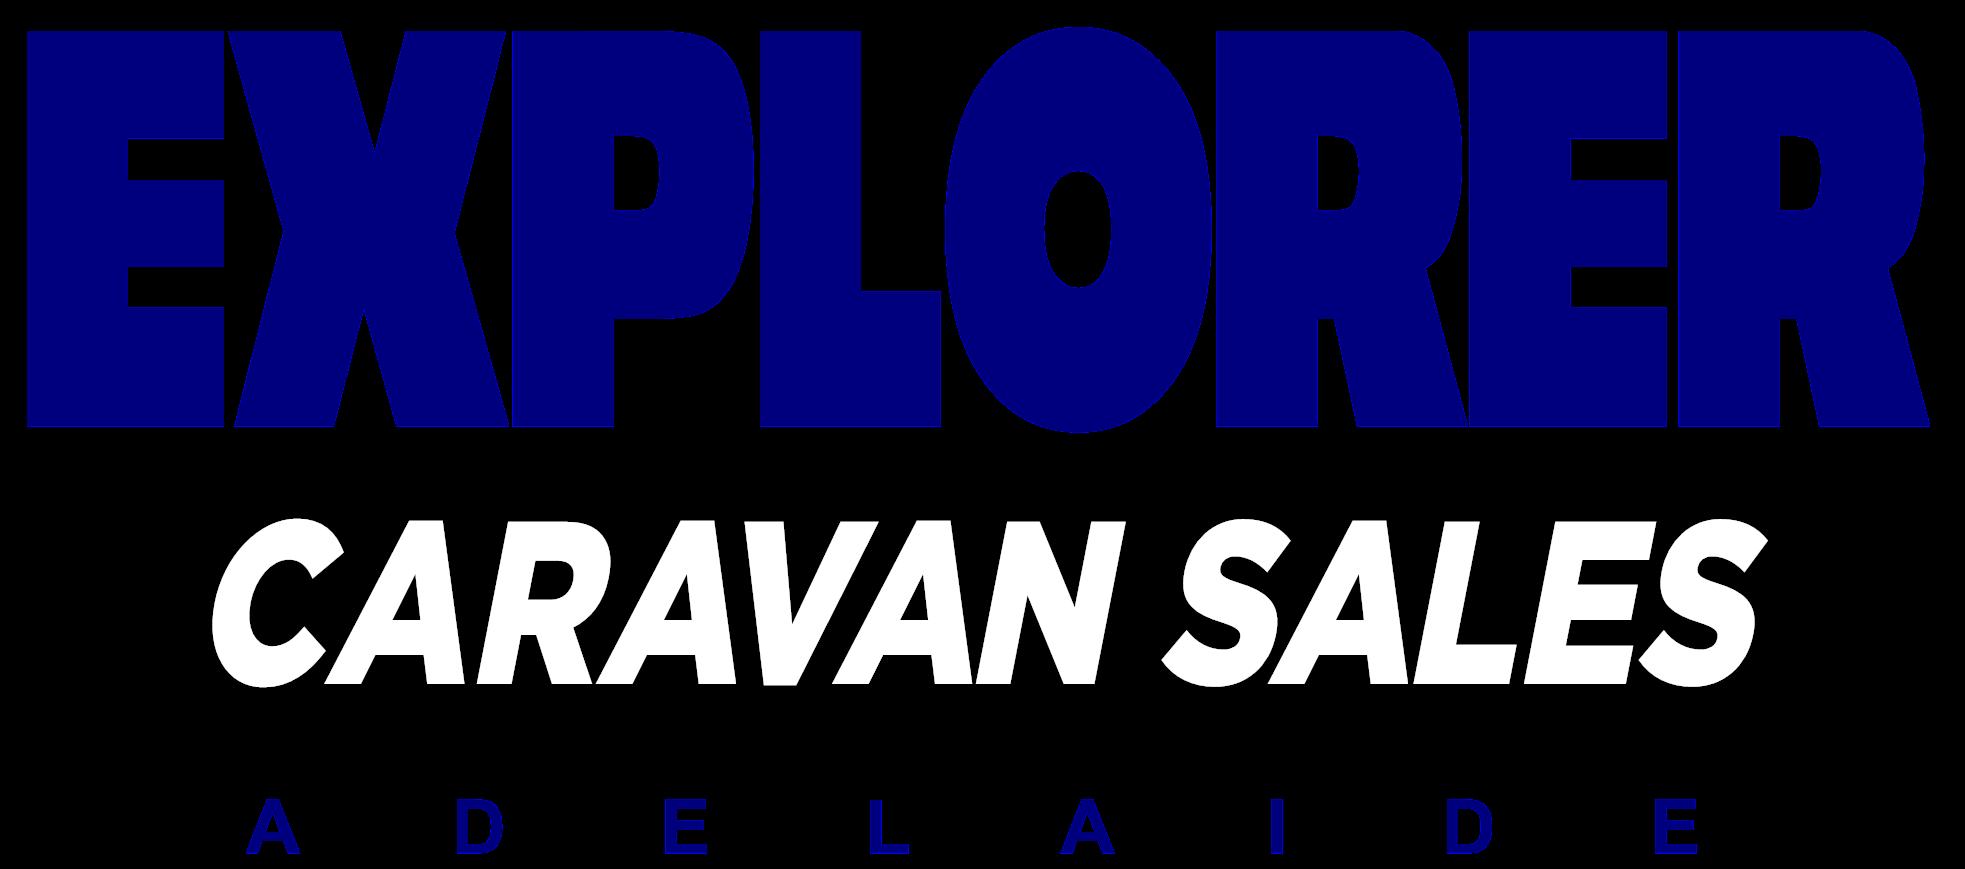 Explorer Caravan Sales Adelaide